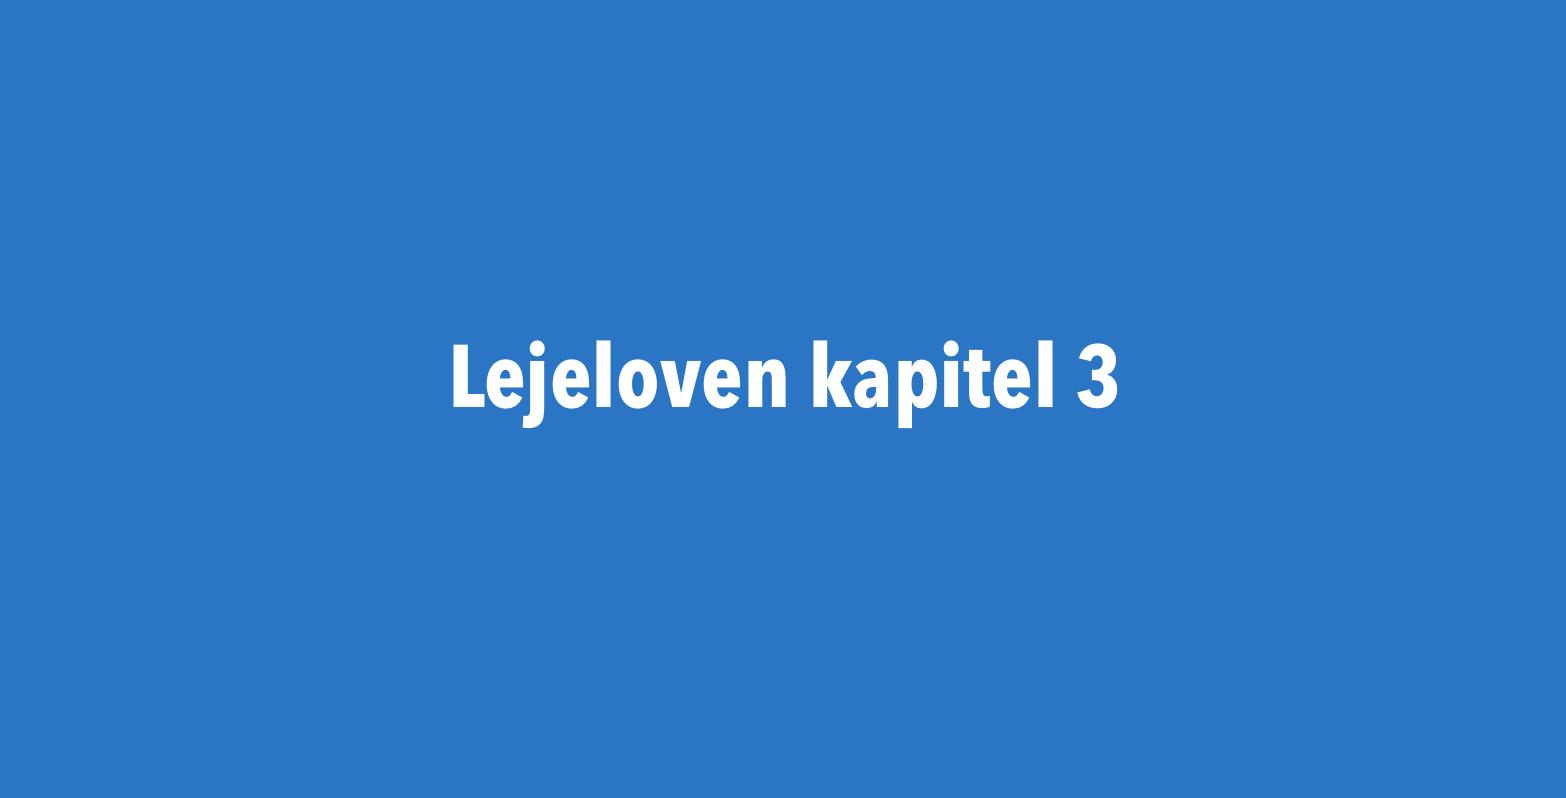 Lejelovens kapital 3